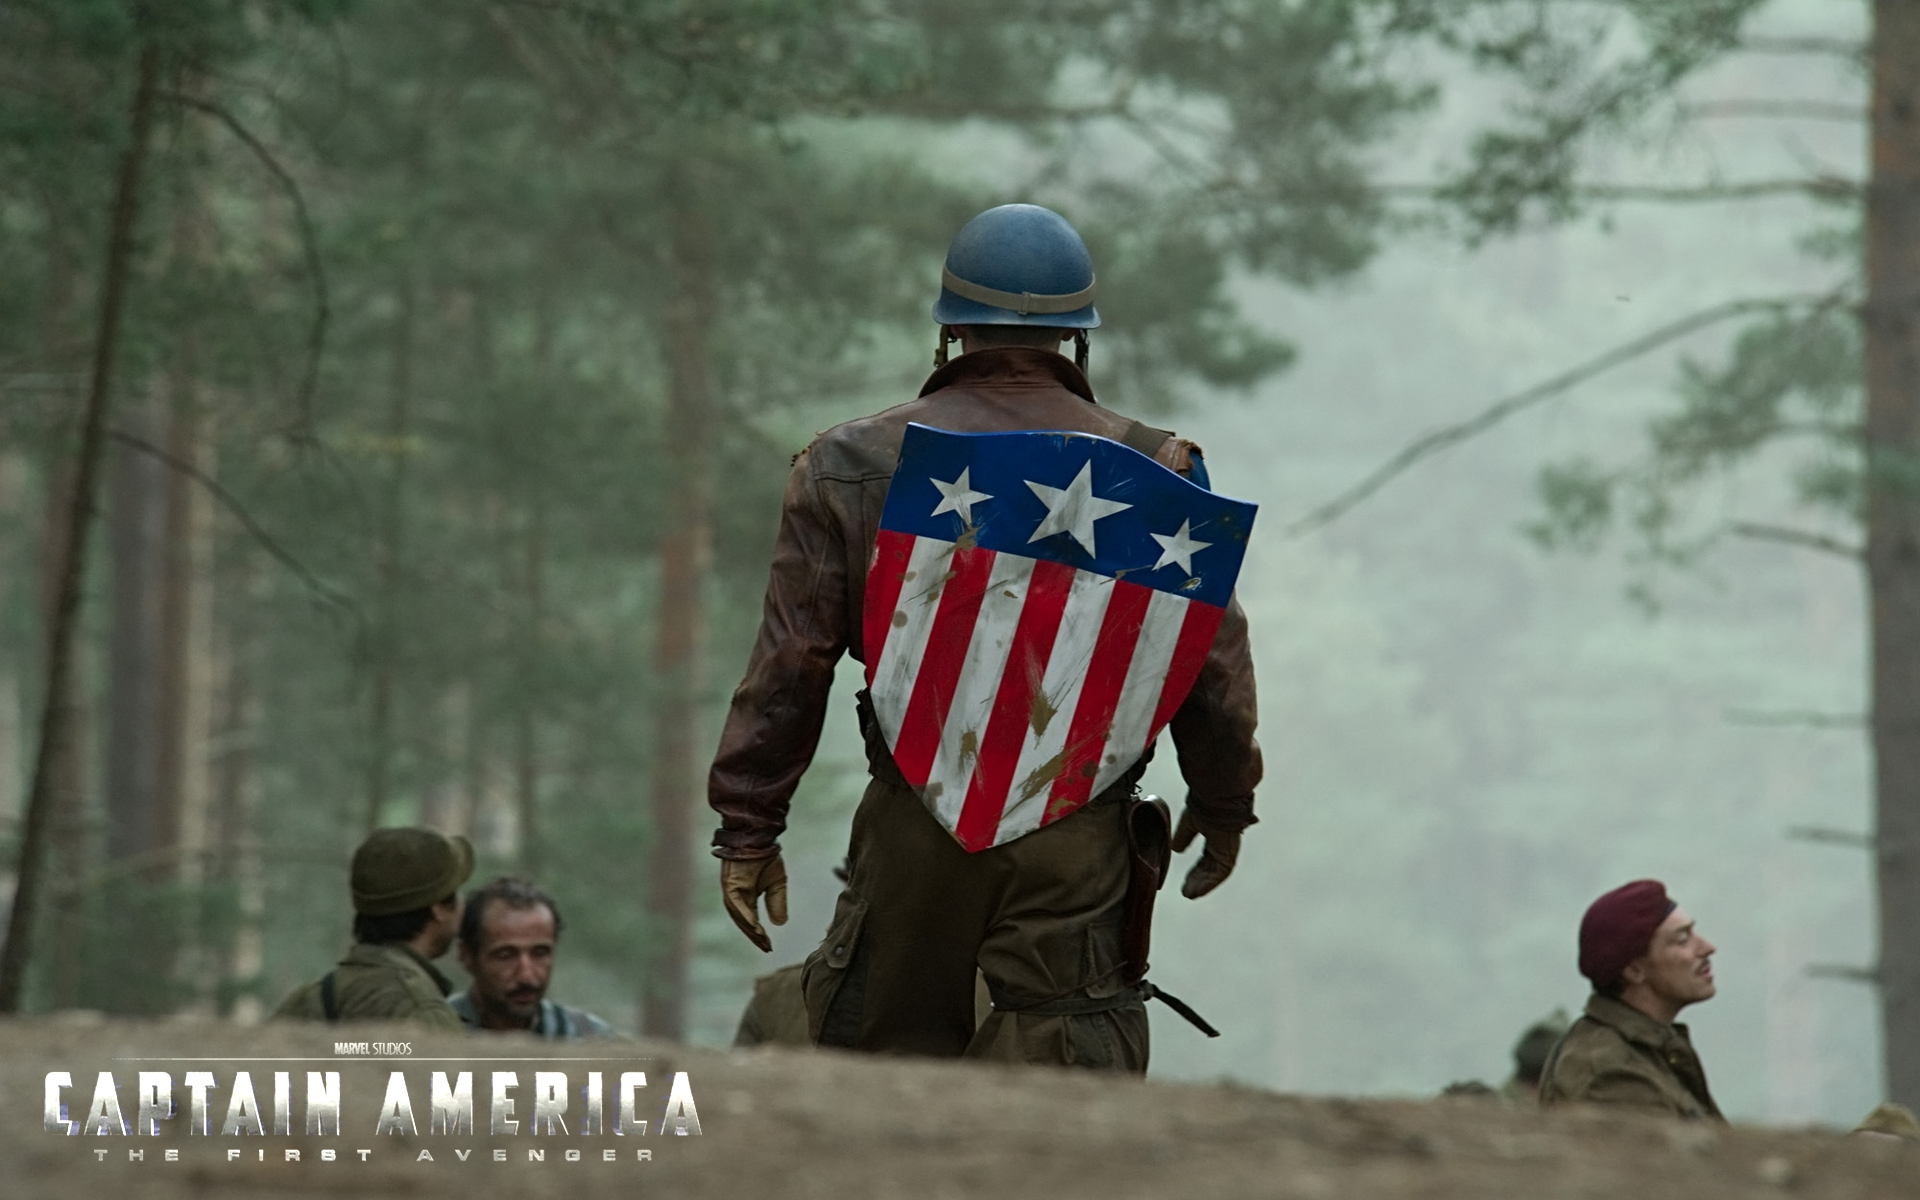 Papel De Parede Capitao America Inimigo Wallpaper Para Download